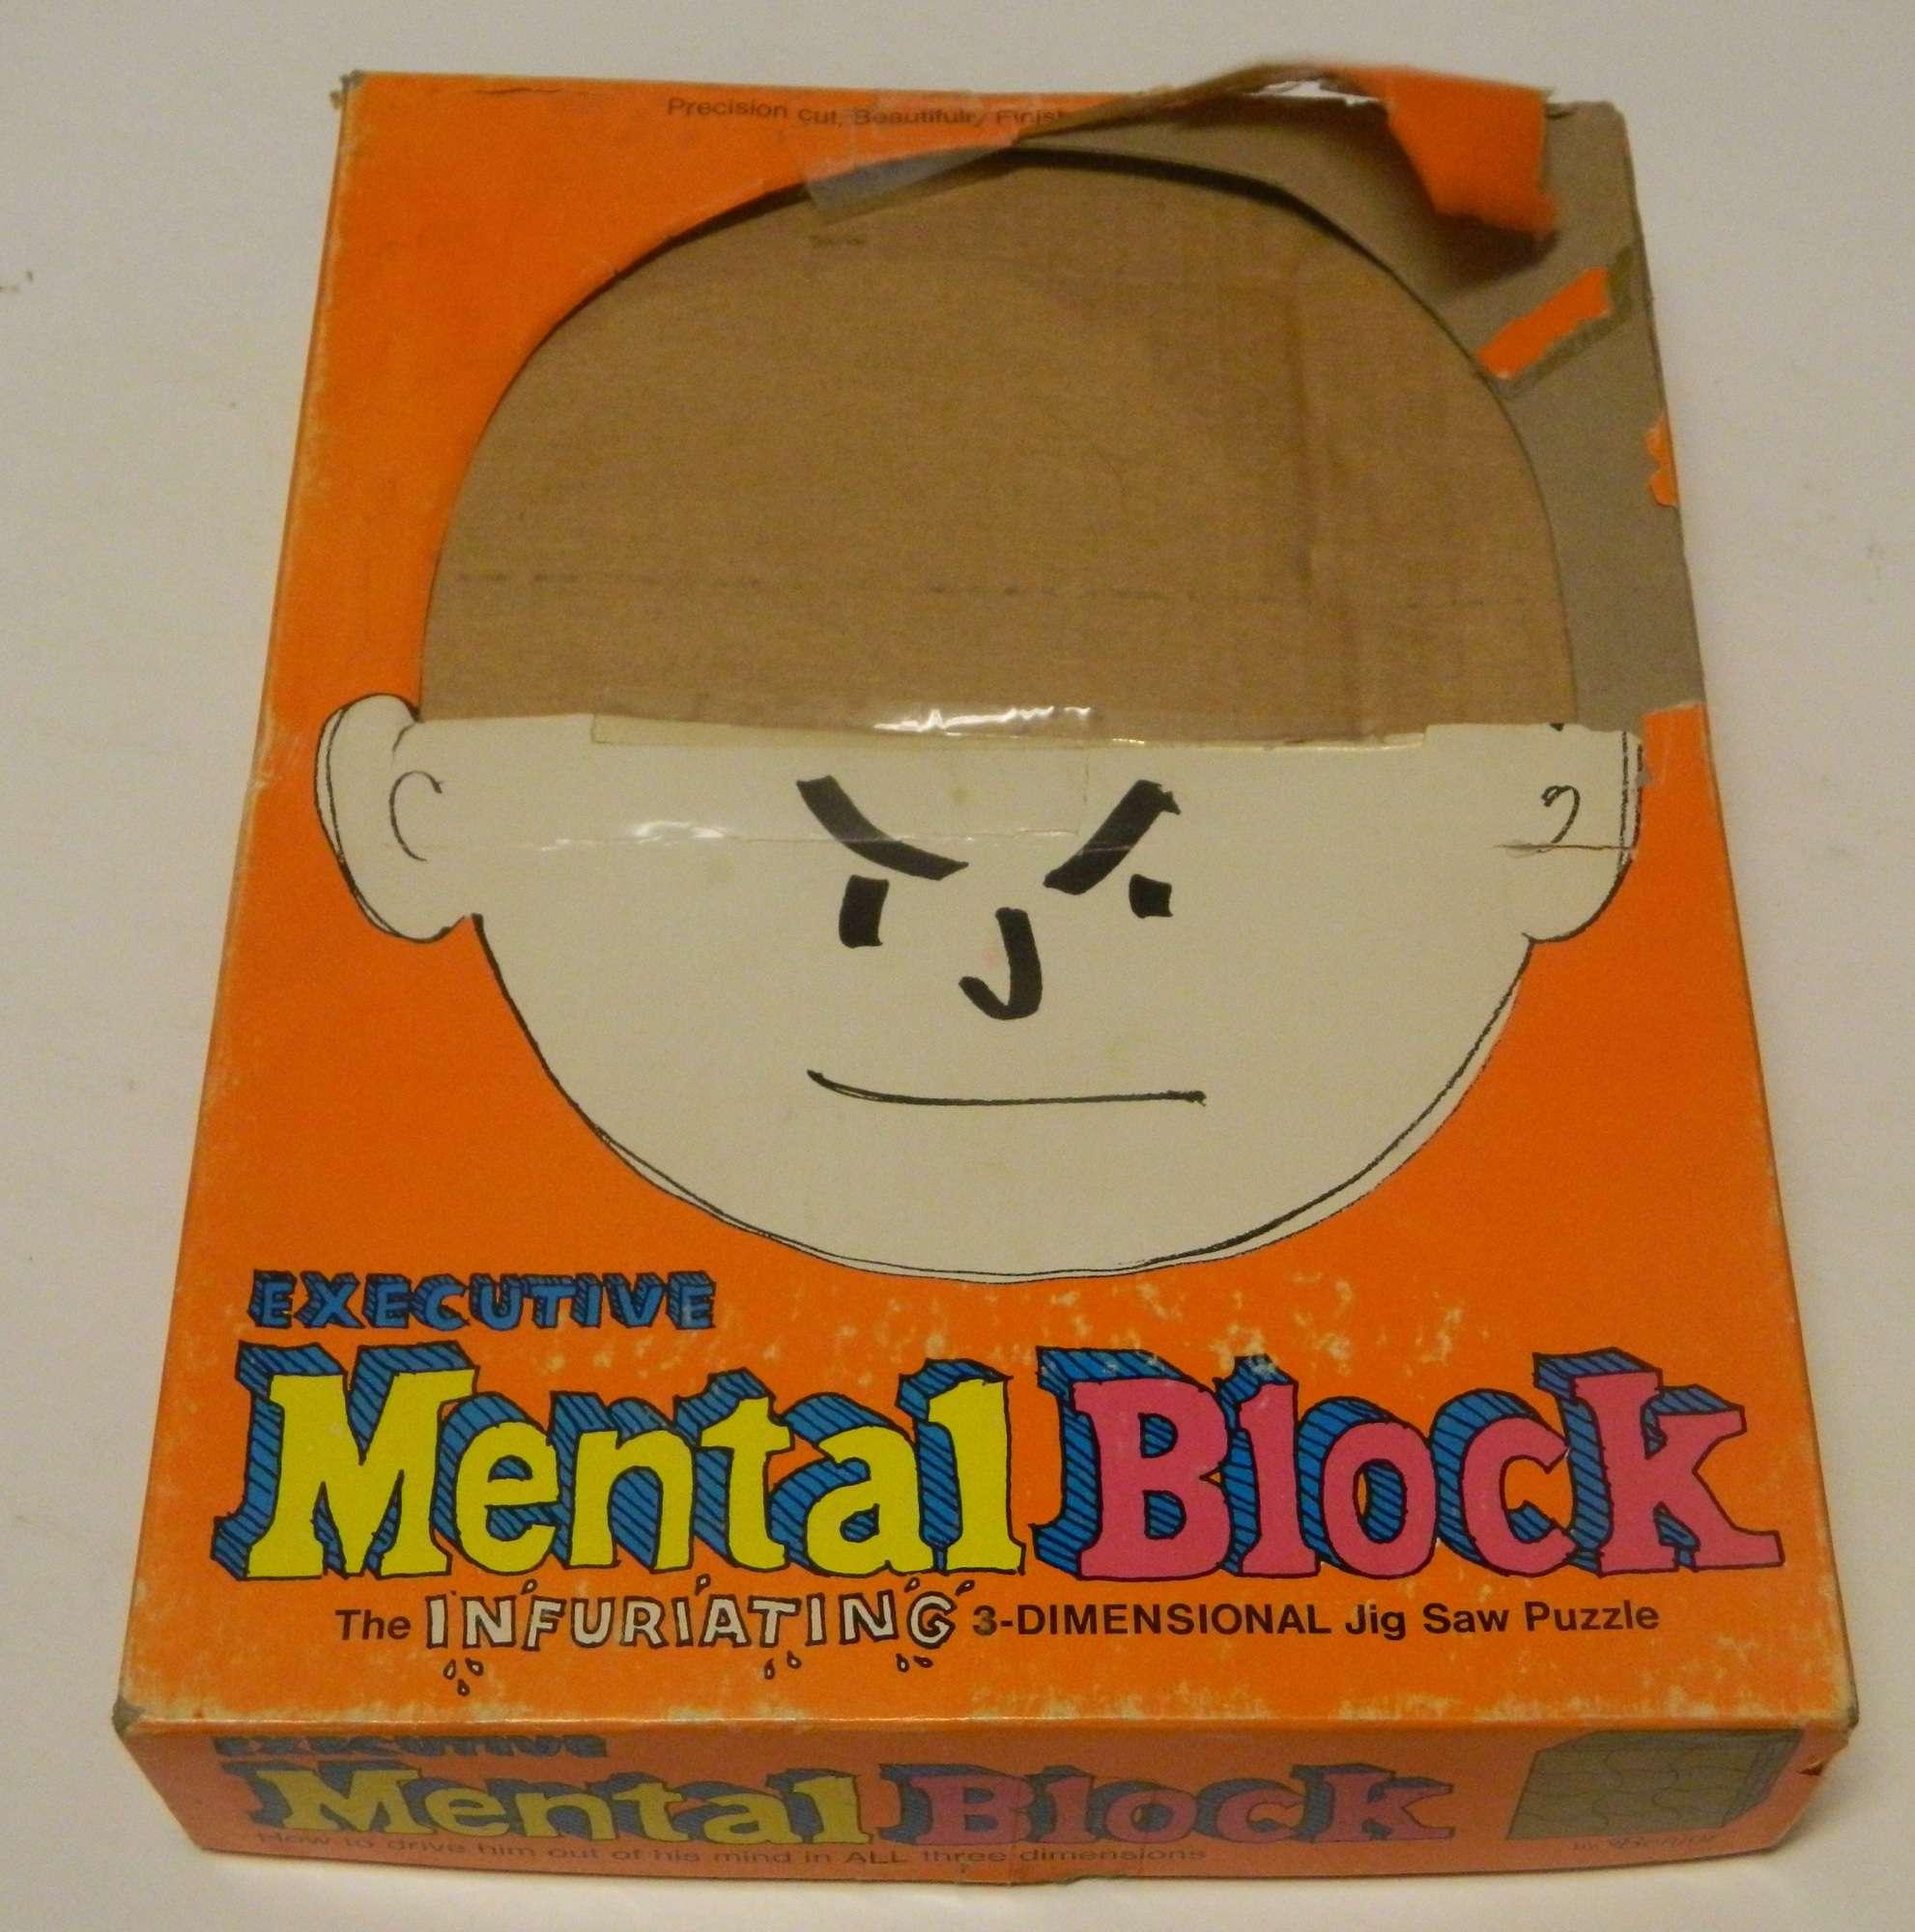 Box for Executive Mental Block